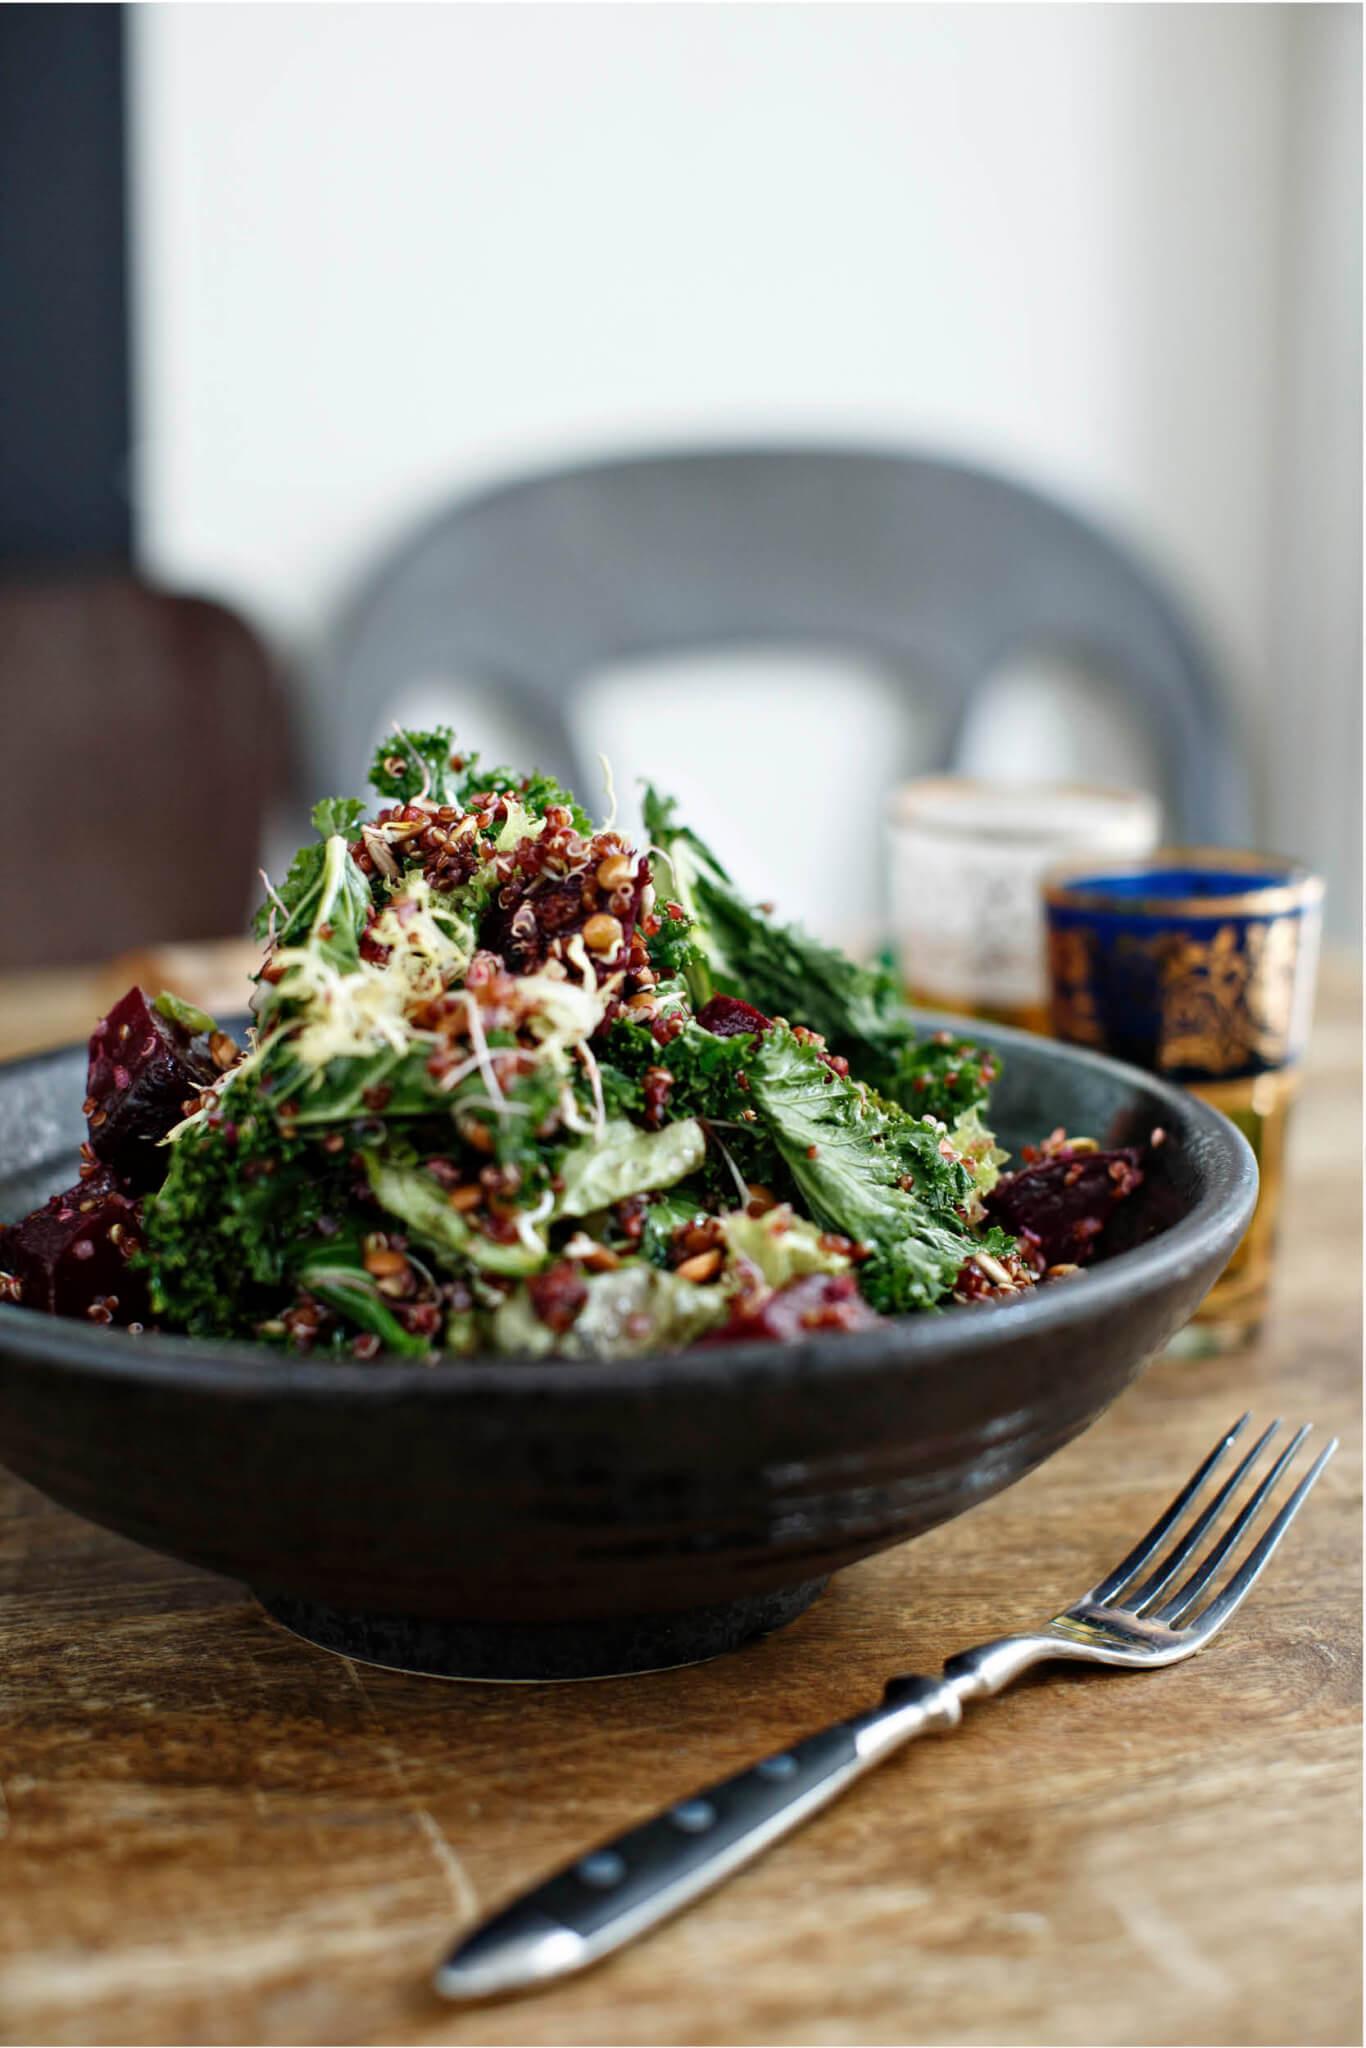 Sprouted lentil kale salad // Peggy試過把新鮮食材拌成沙律,當中的豆芽、扁豆及堅果都可以幫肋消化。(Josephine Rozman攝)